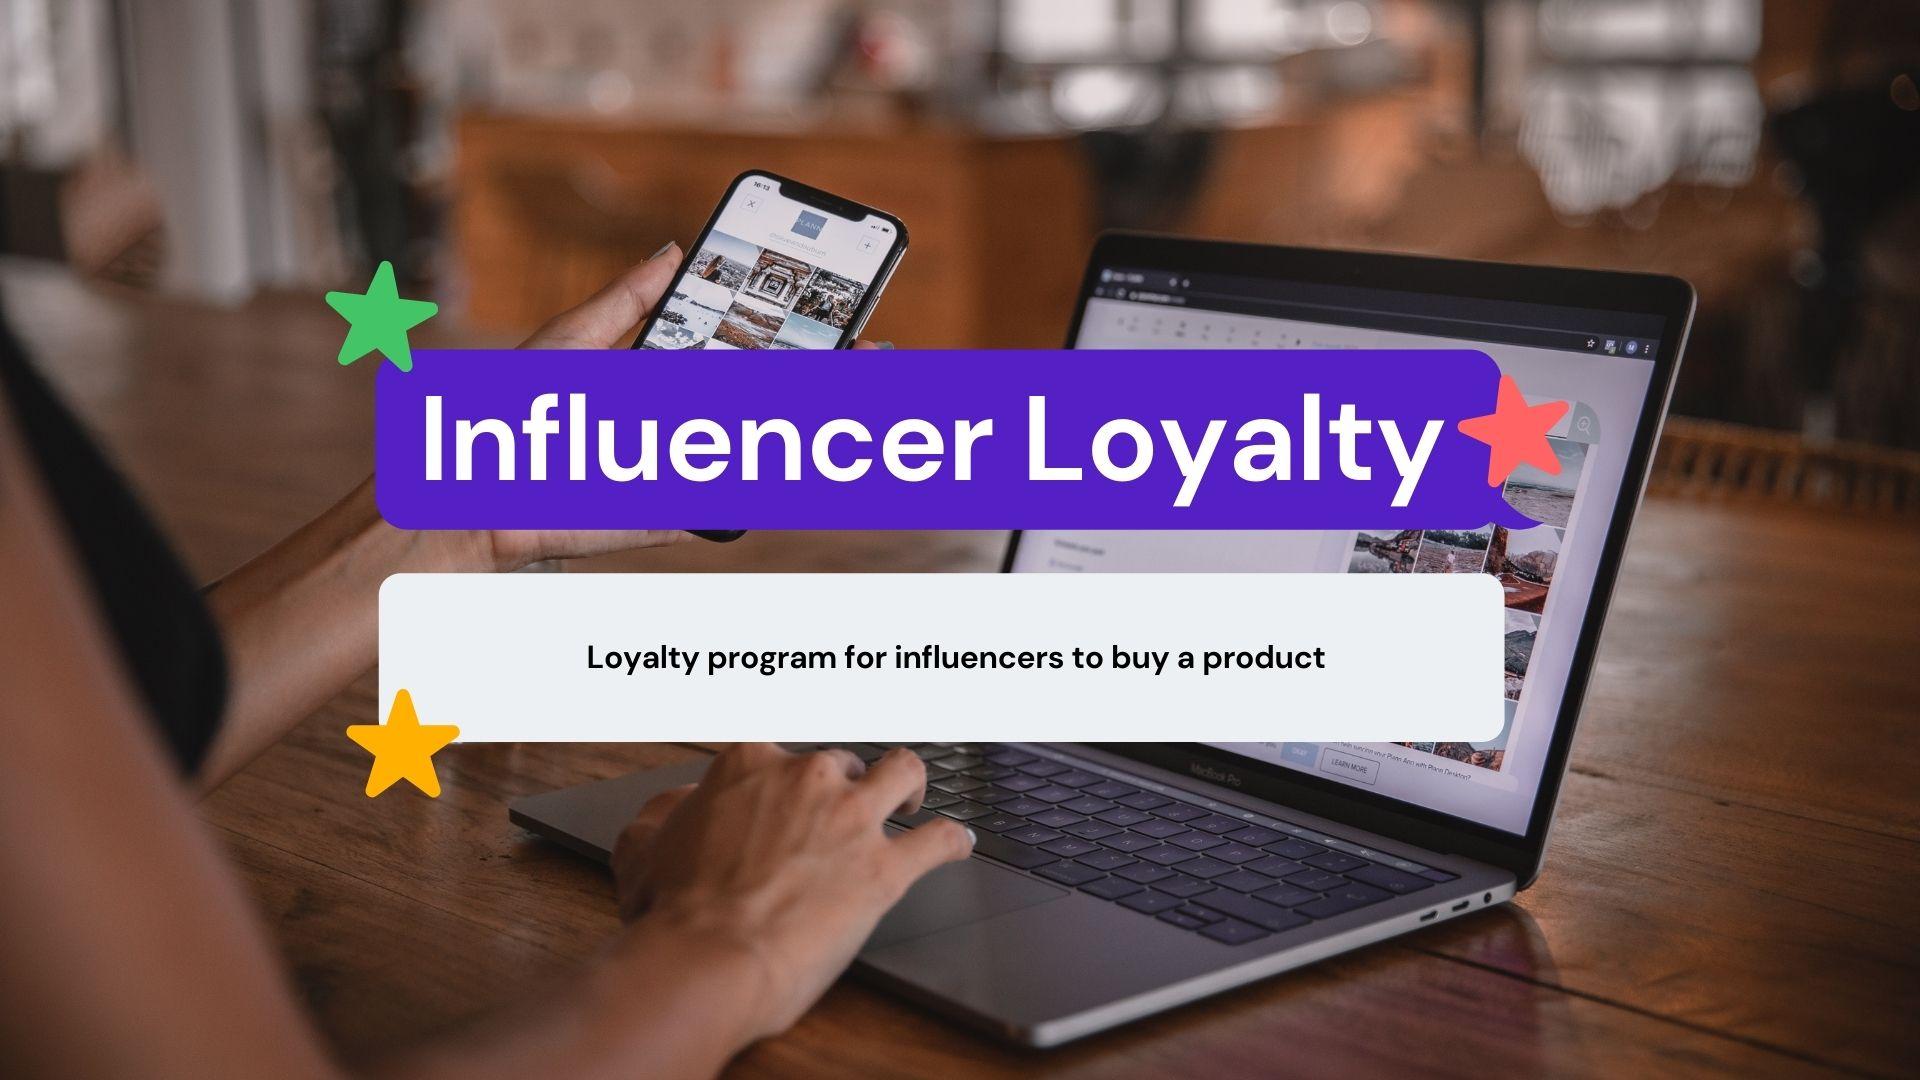 Influencer Loyalty Programs by CXBOX